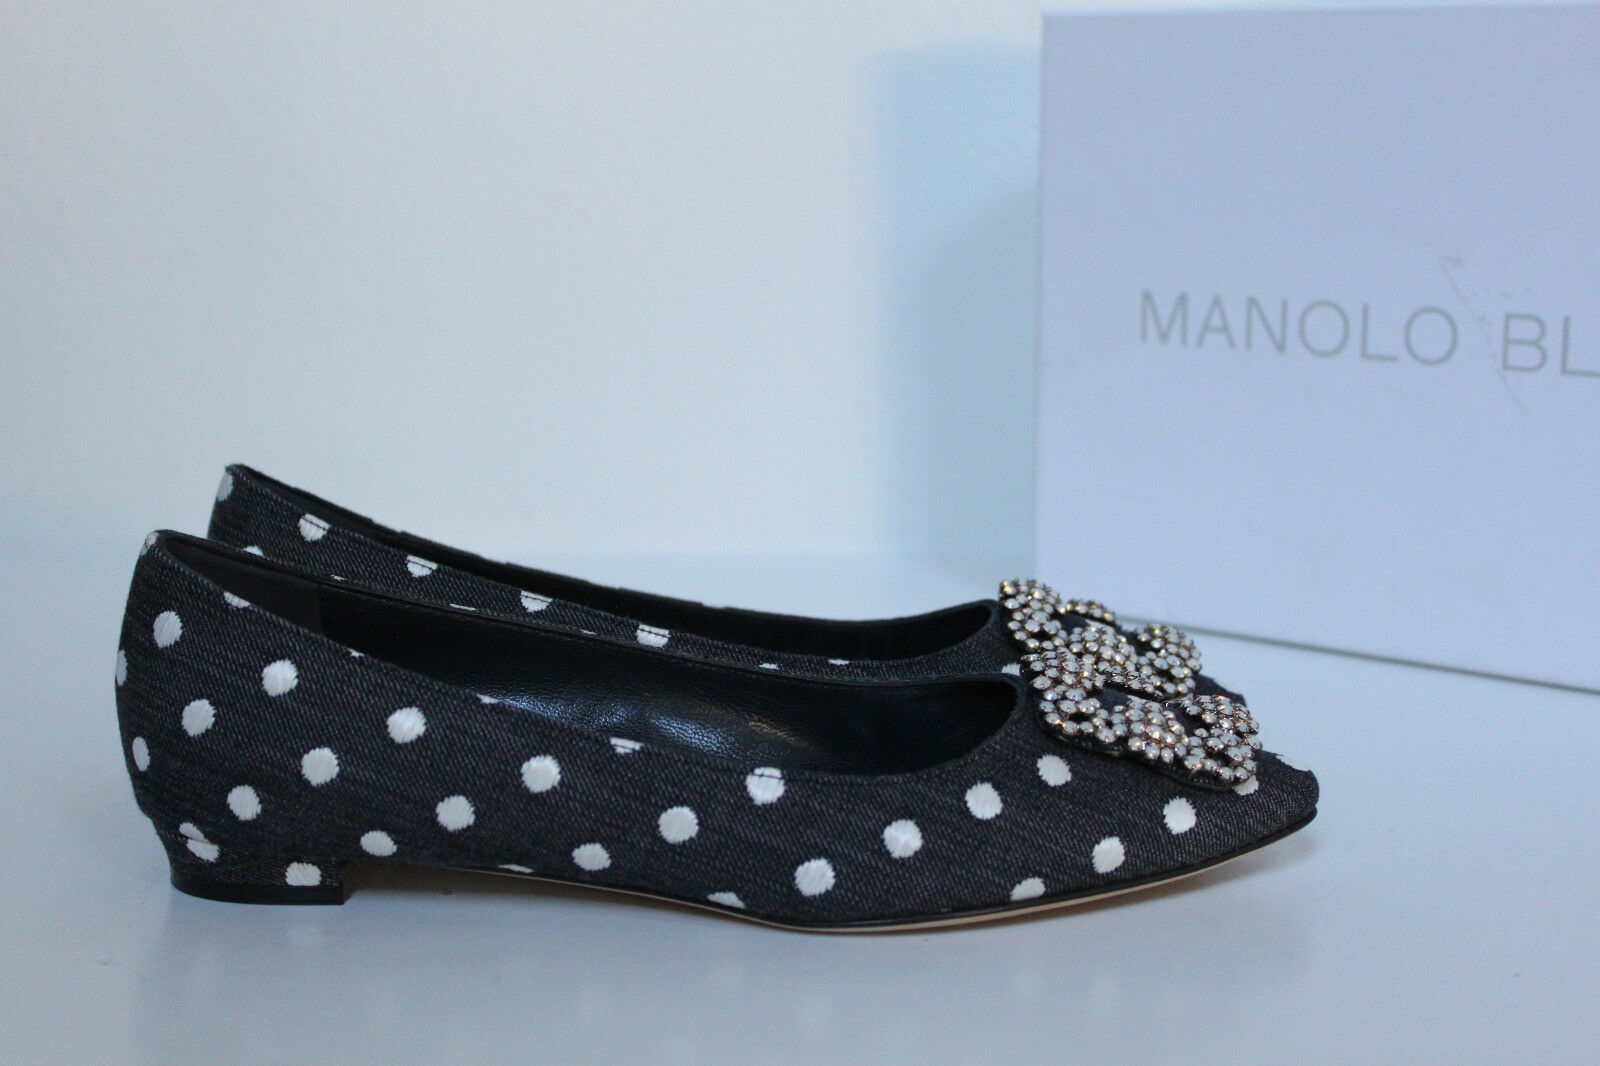 sz 9.5 / 39.5 Manolo Blahnik Blue Denim White Dot Hangisi Brooch Jewel Flat Shoe